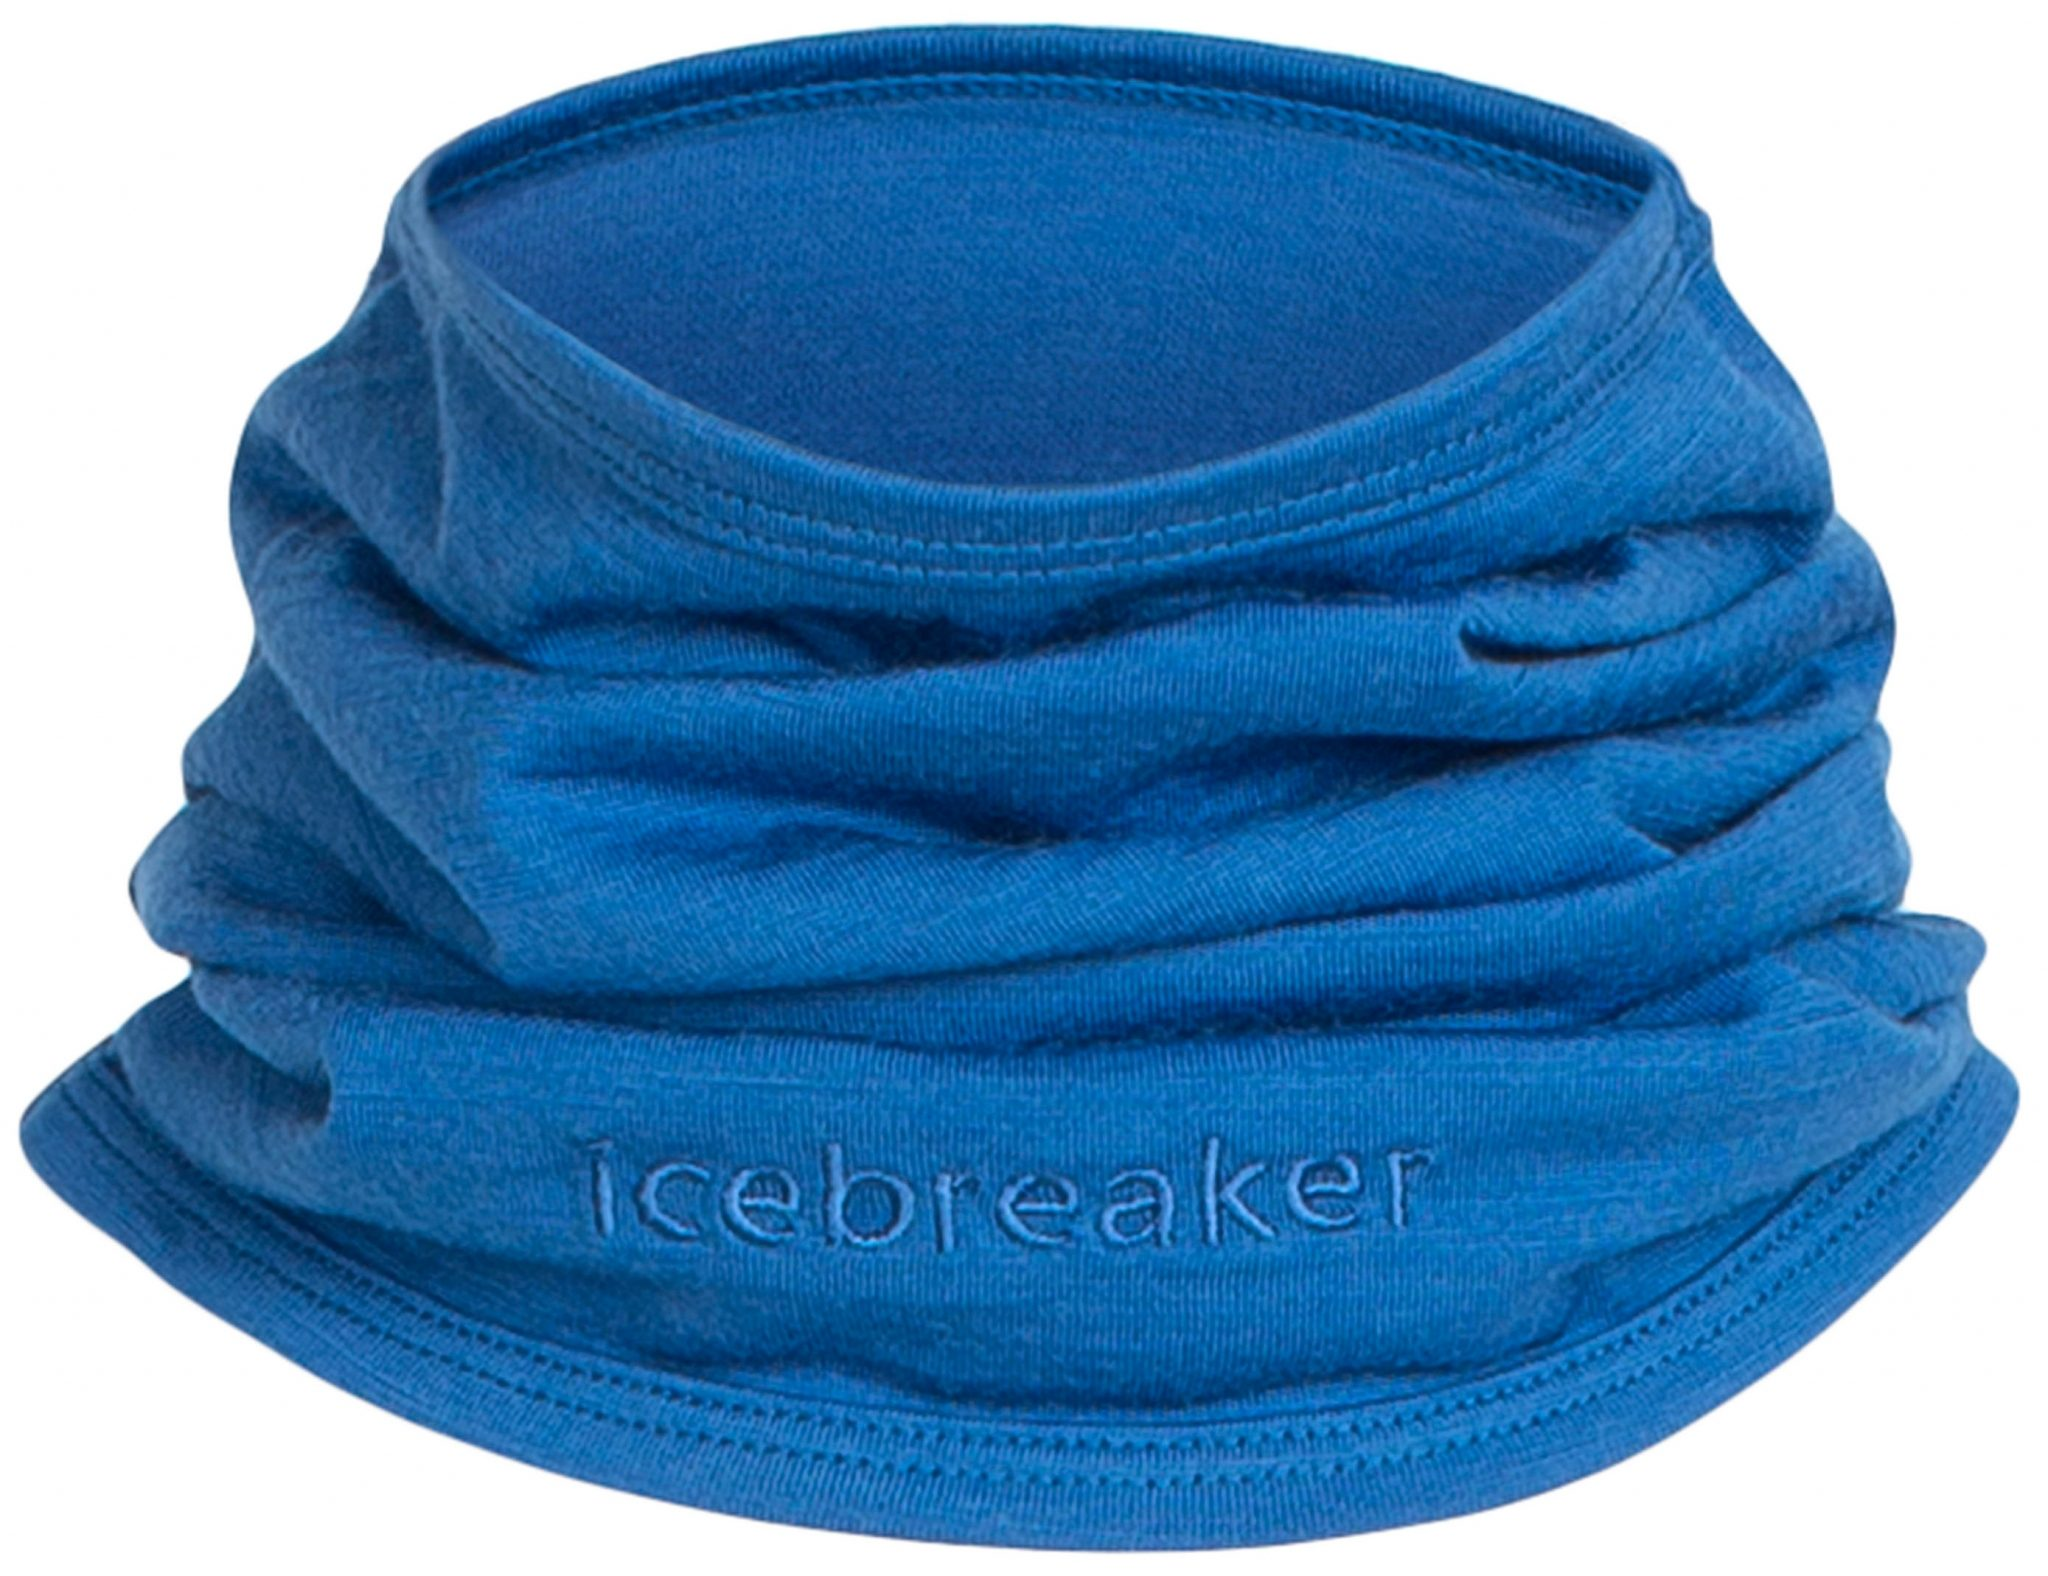 Icebreaker Schal »Flexi Chute Kids«